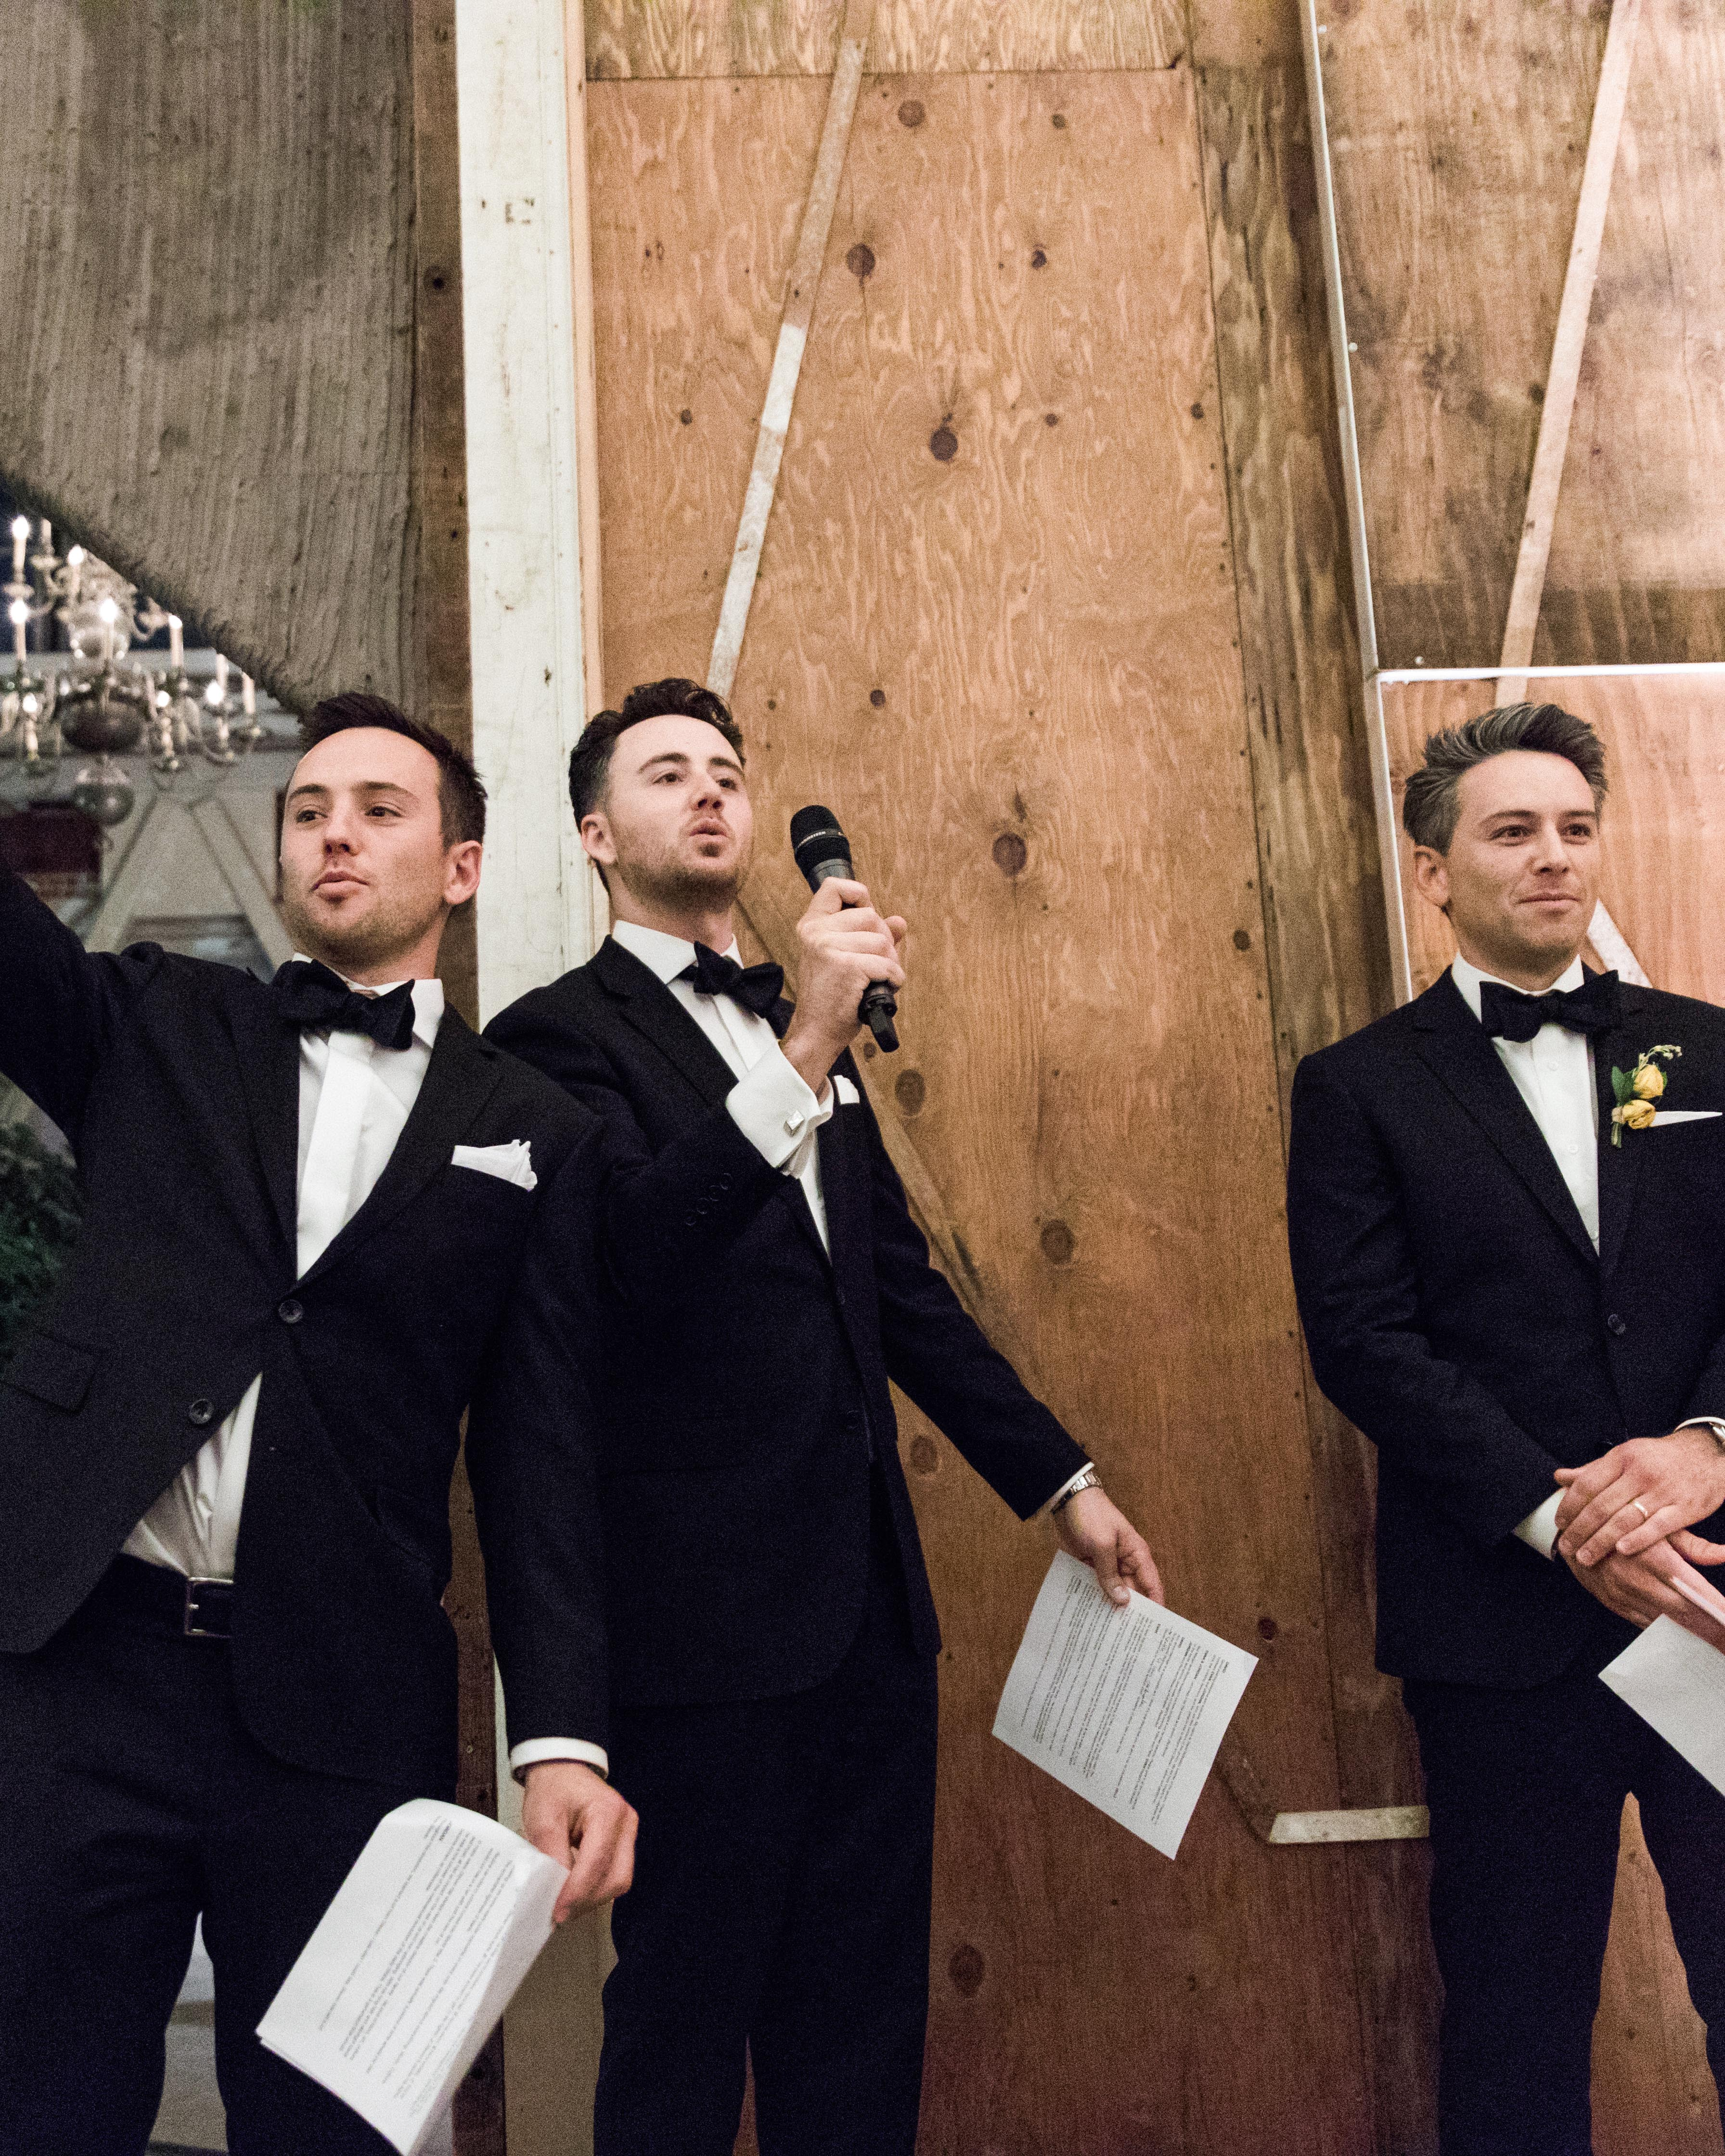 wedding three groomsman toast